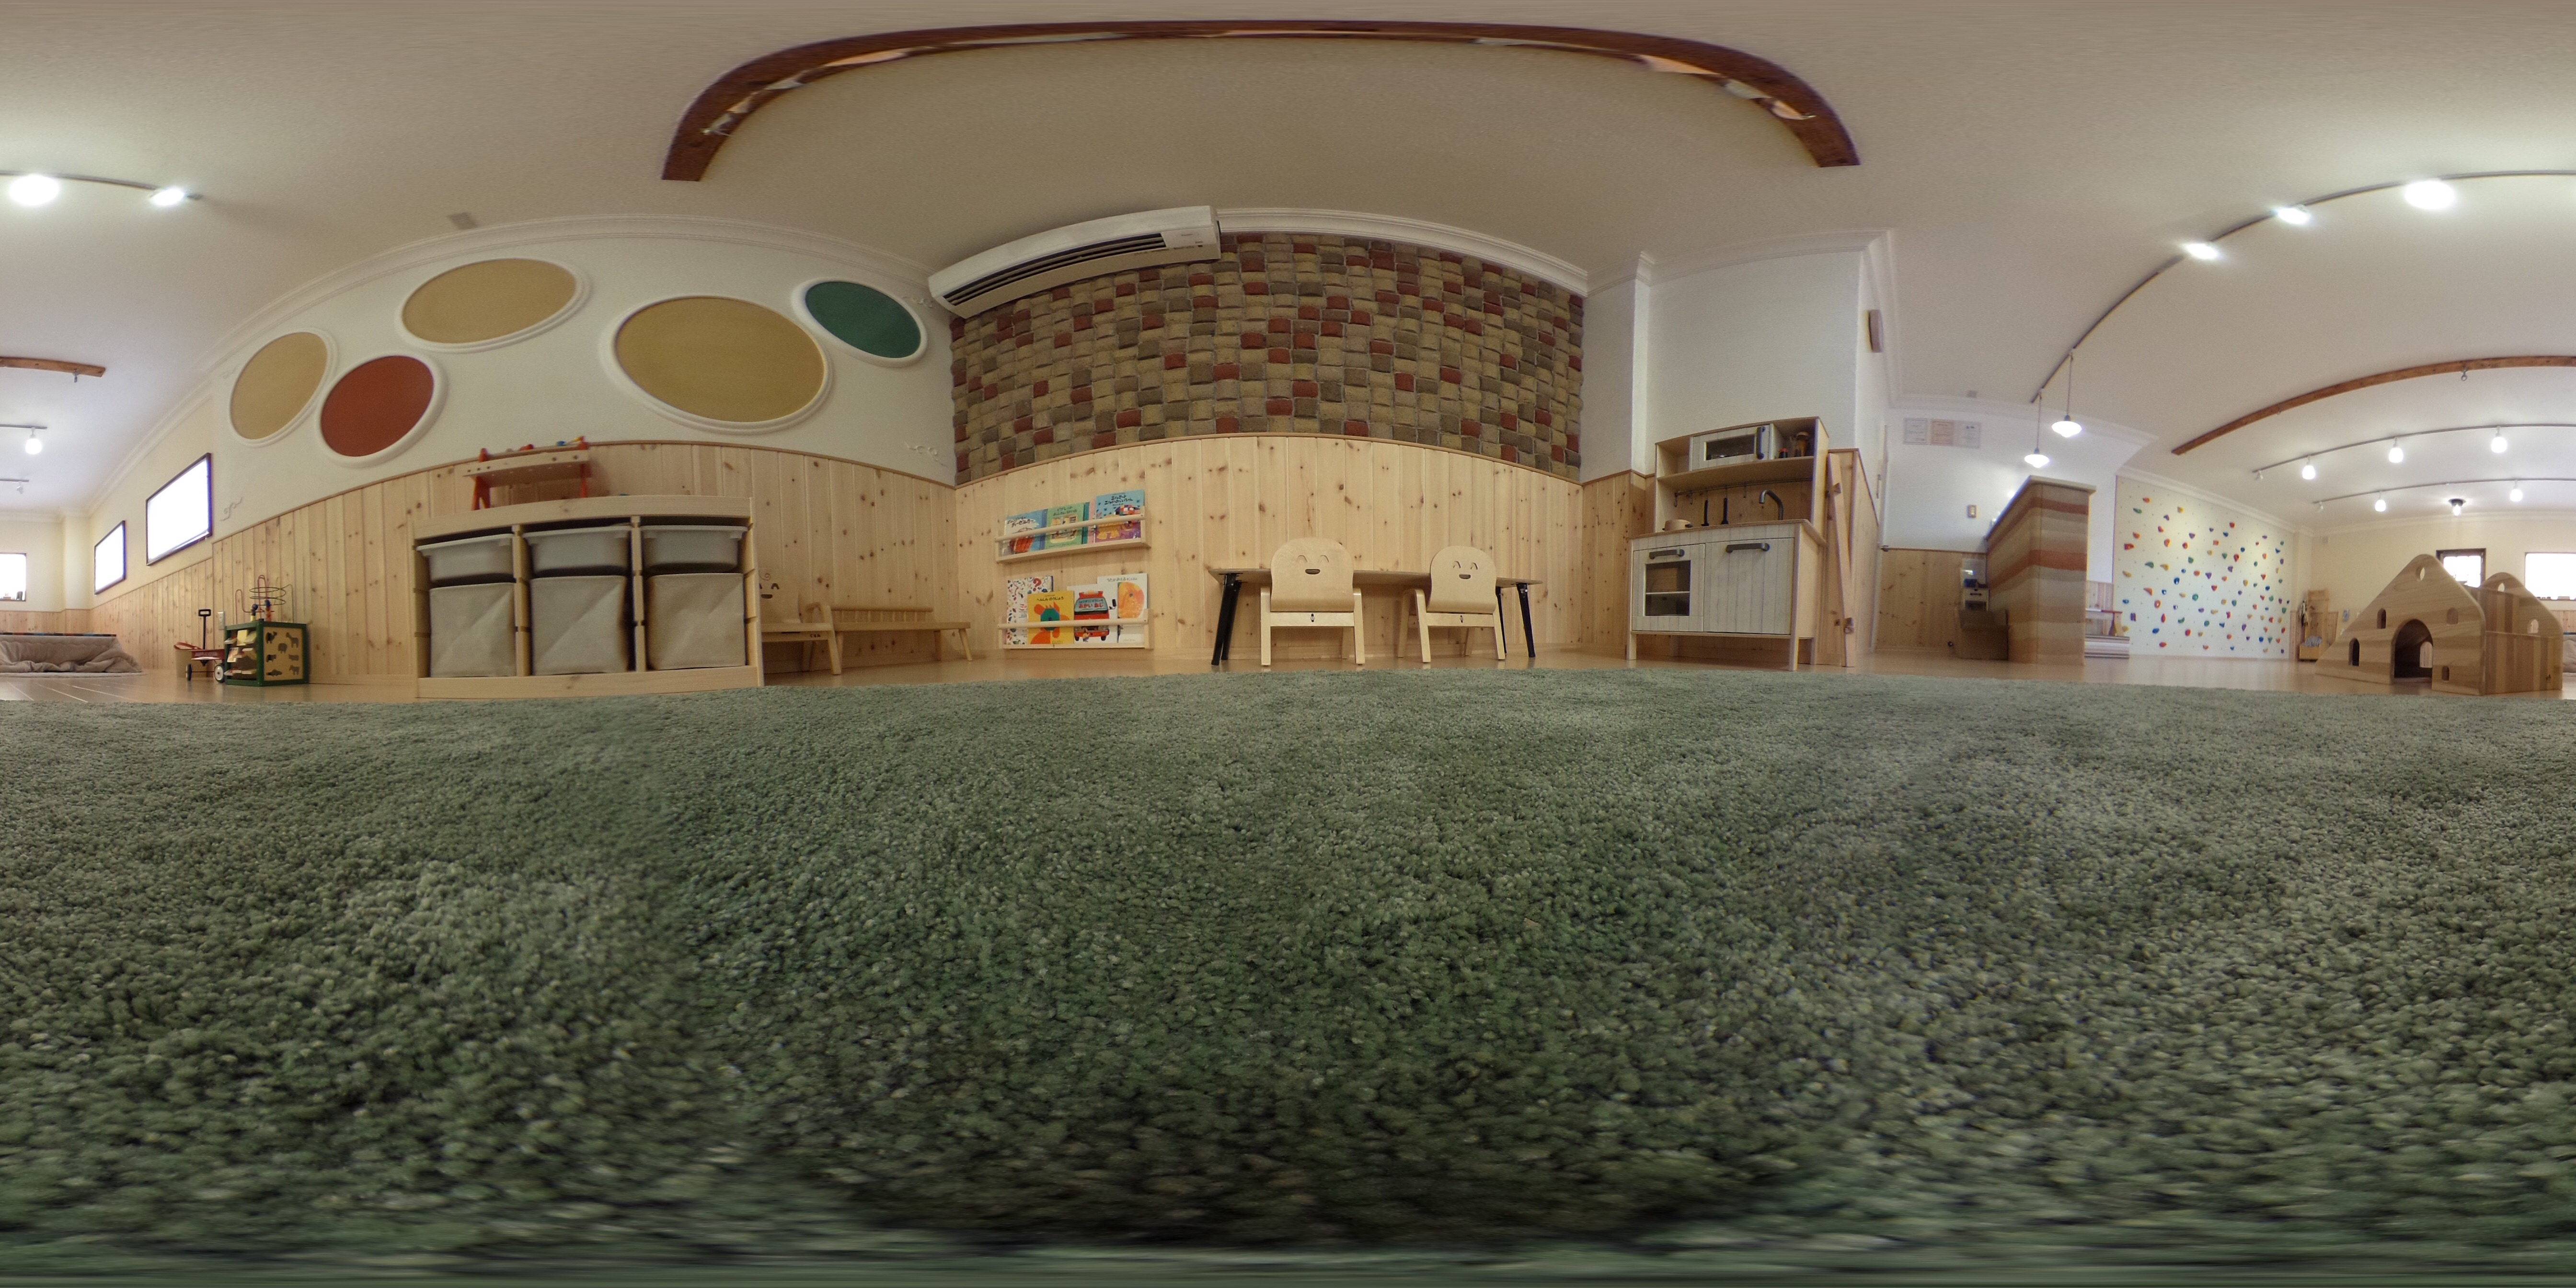 神戸市北区北五葉 保育園 kidsroom Mohala  360°風景